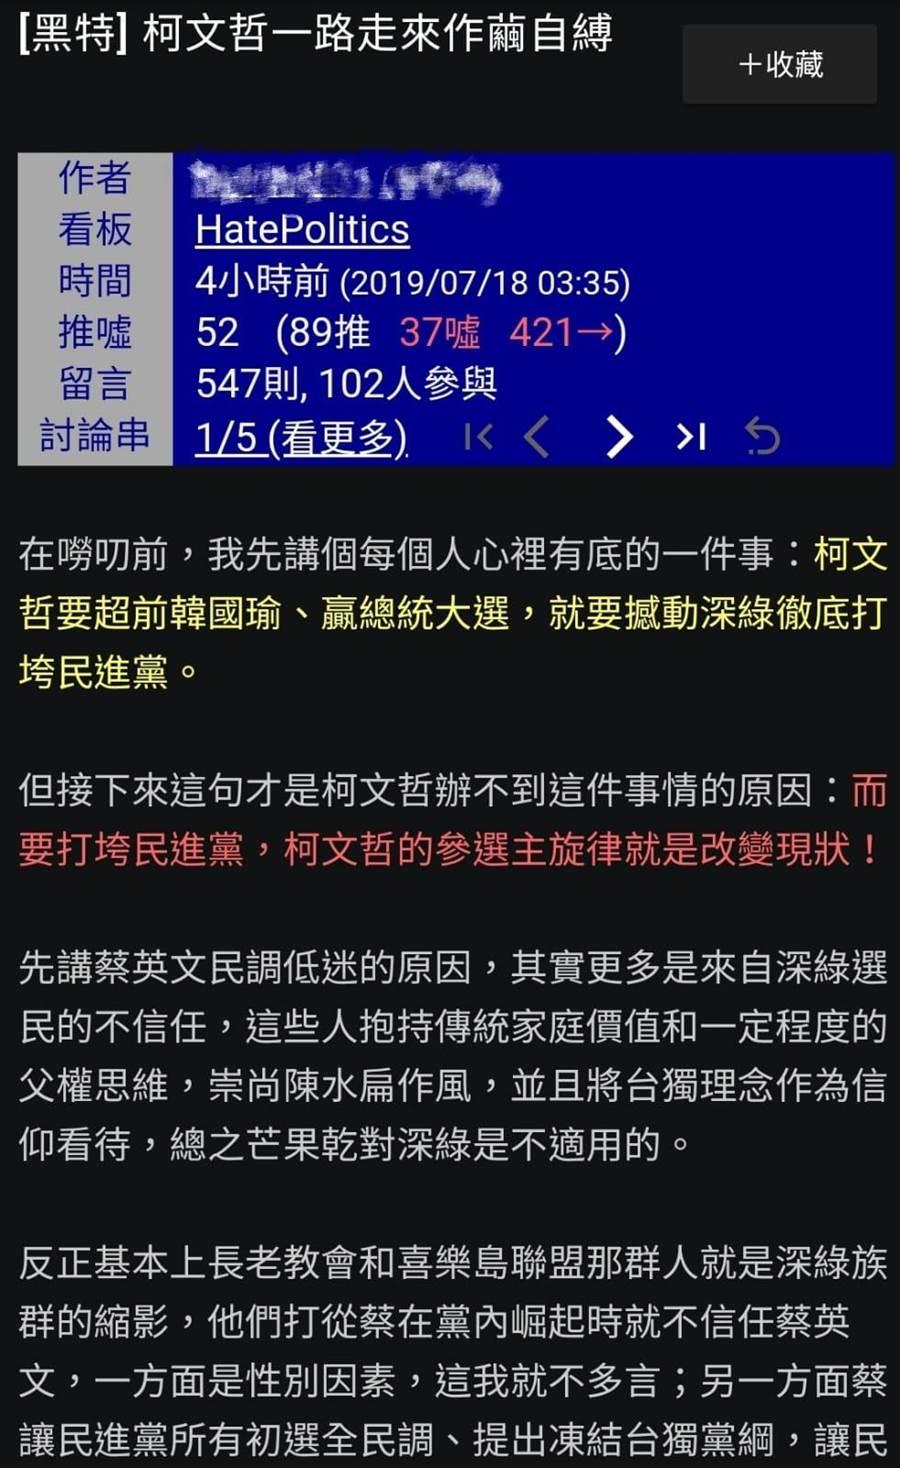 PTT网友发文。(图/翻摄自「批踢踢实业坊」)